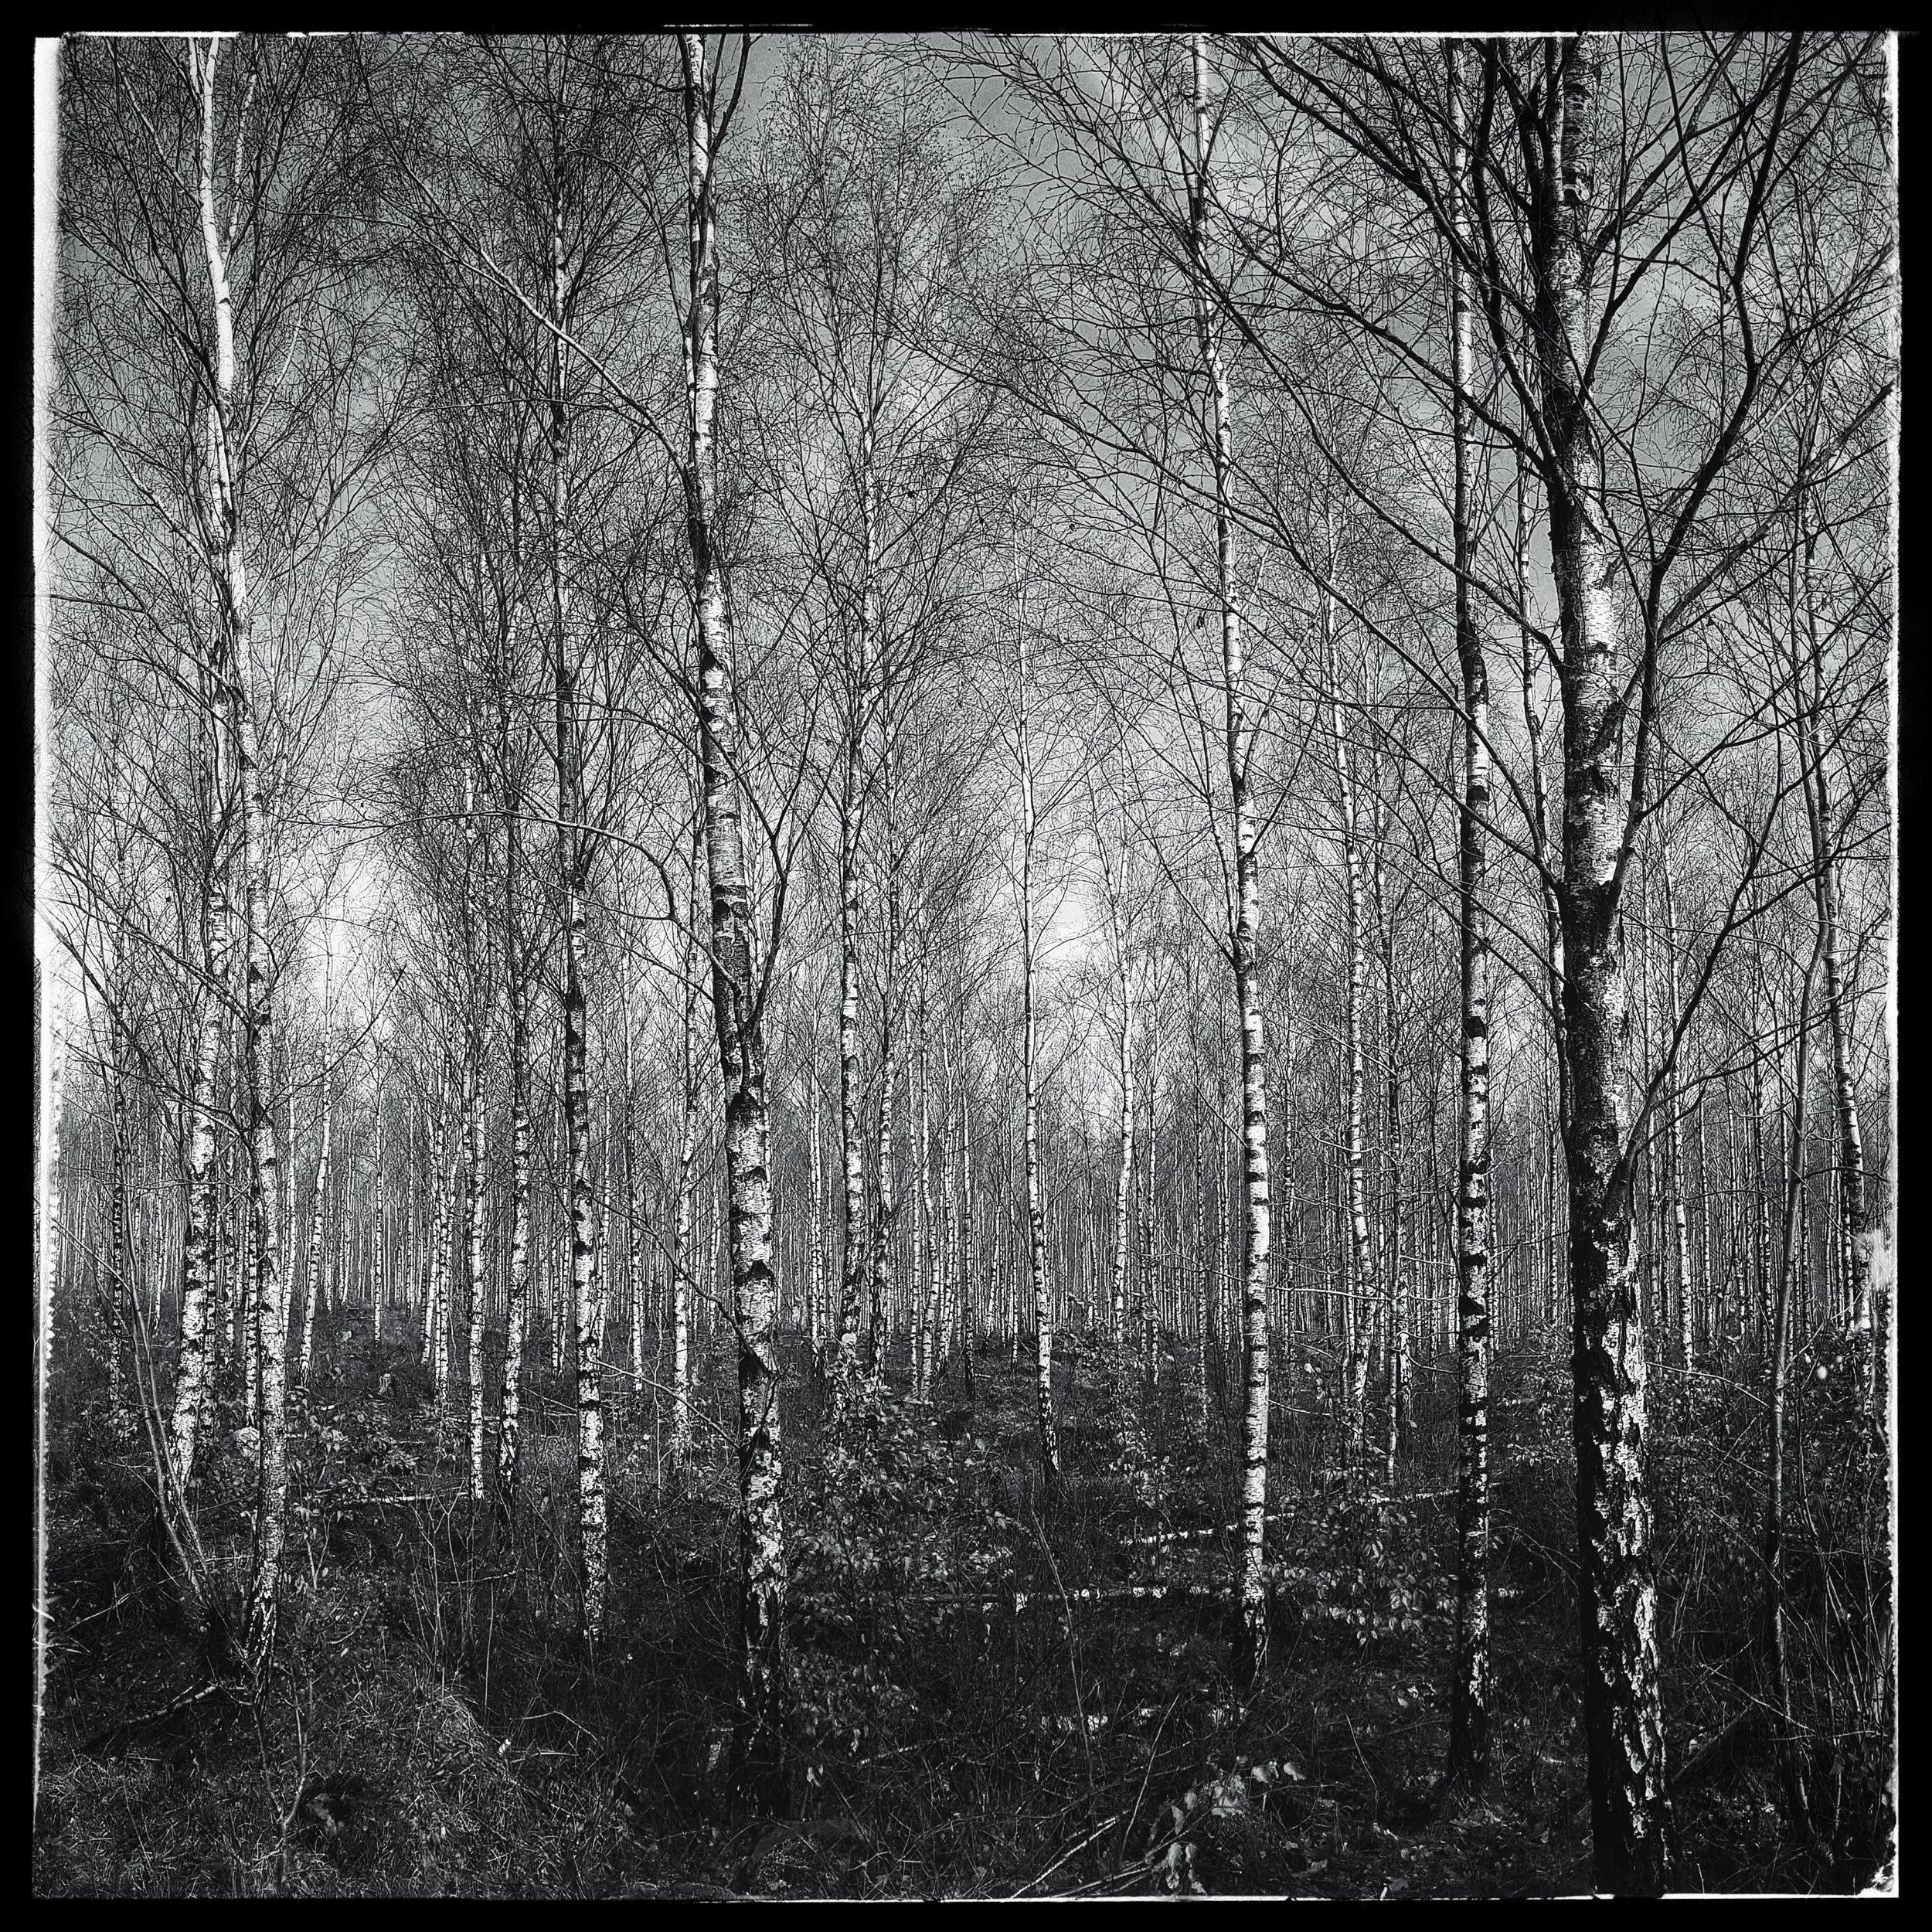 March 4 - Day 63: Birch Tree Bonanza